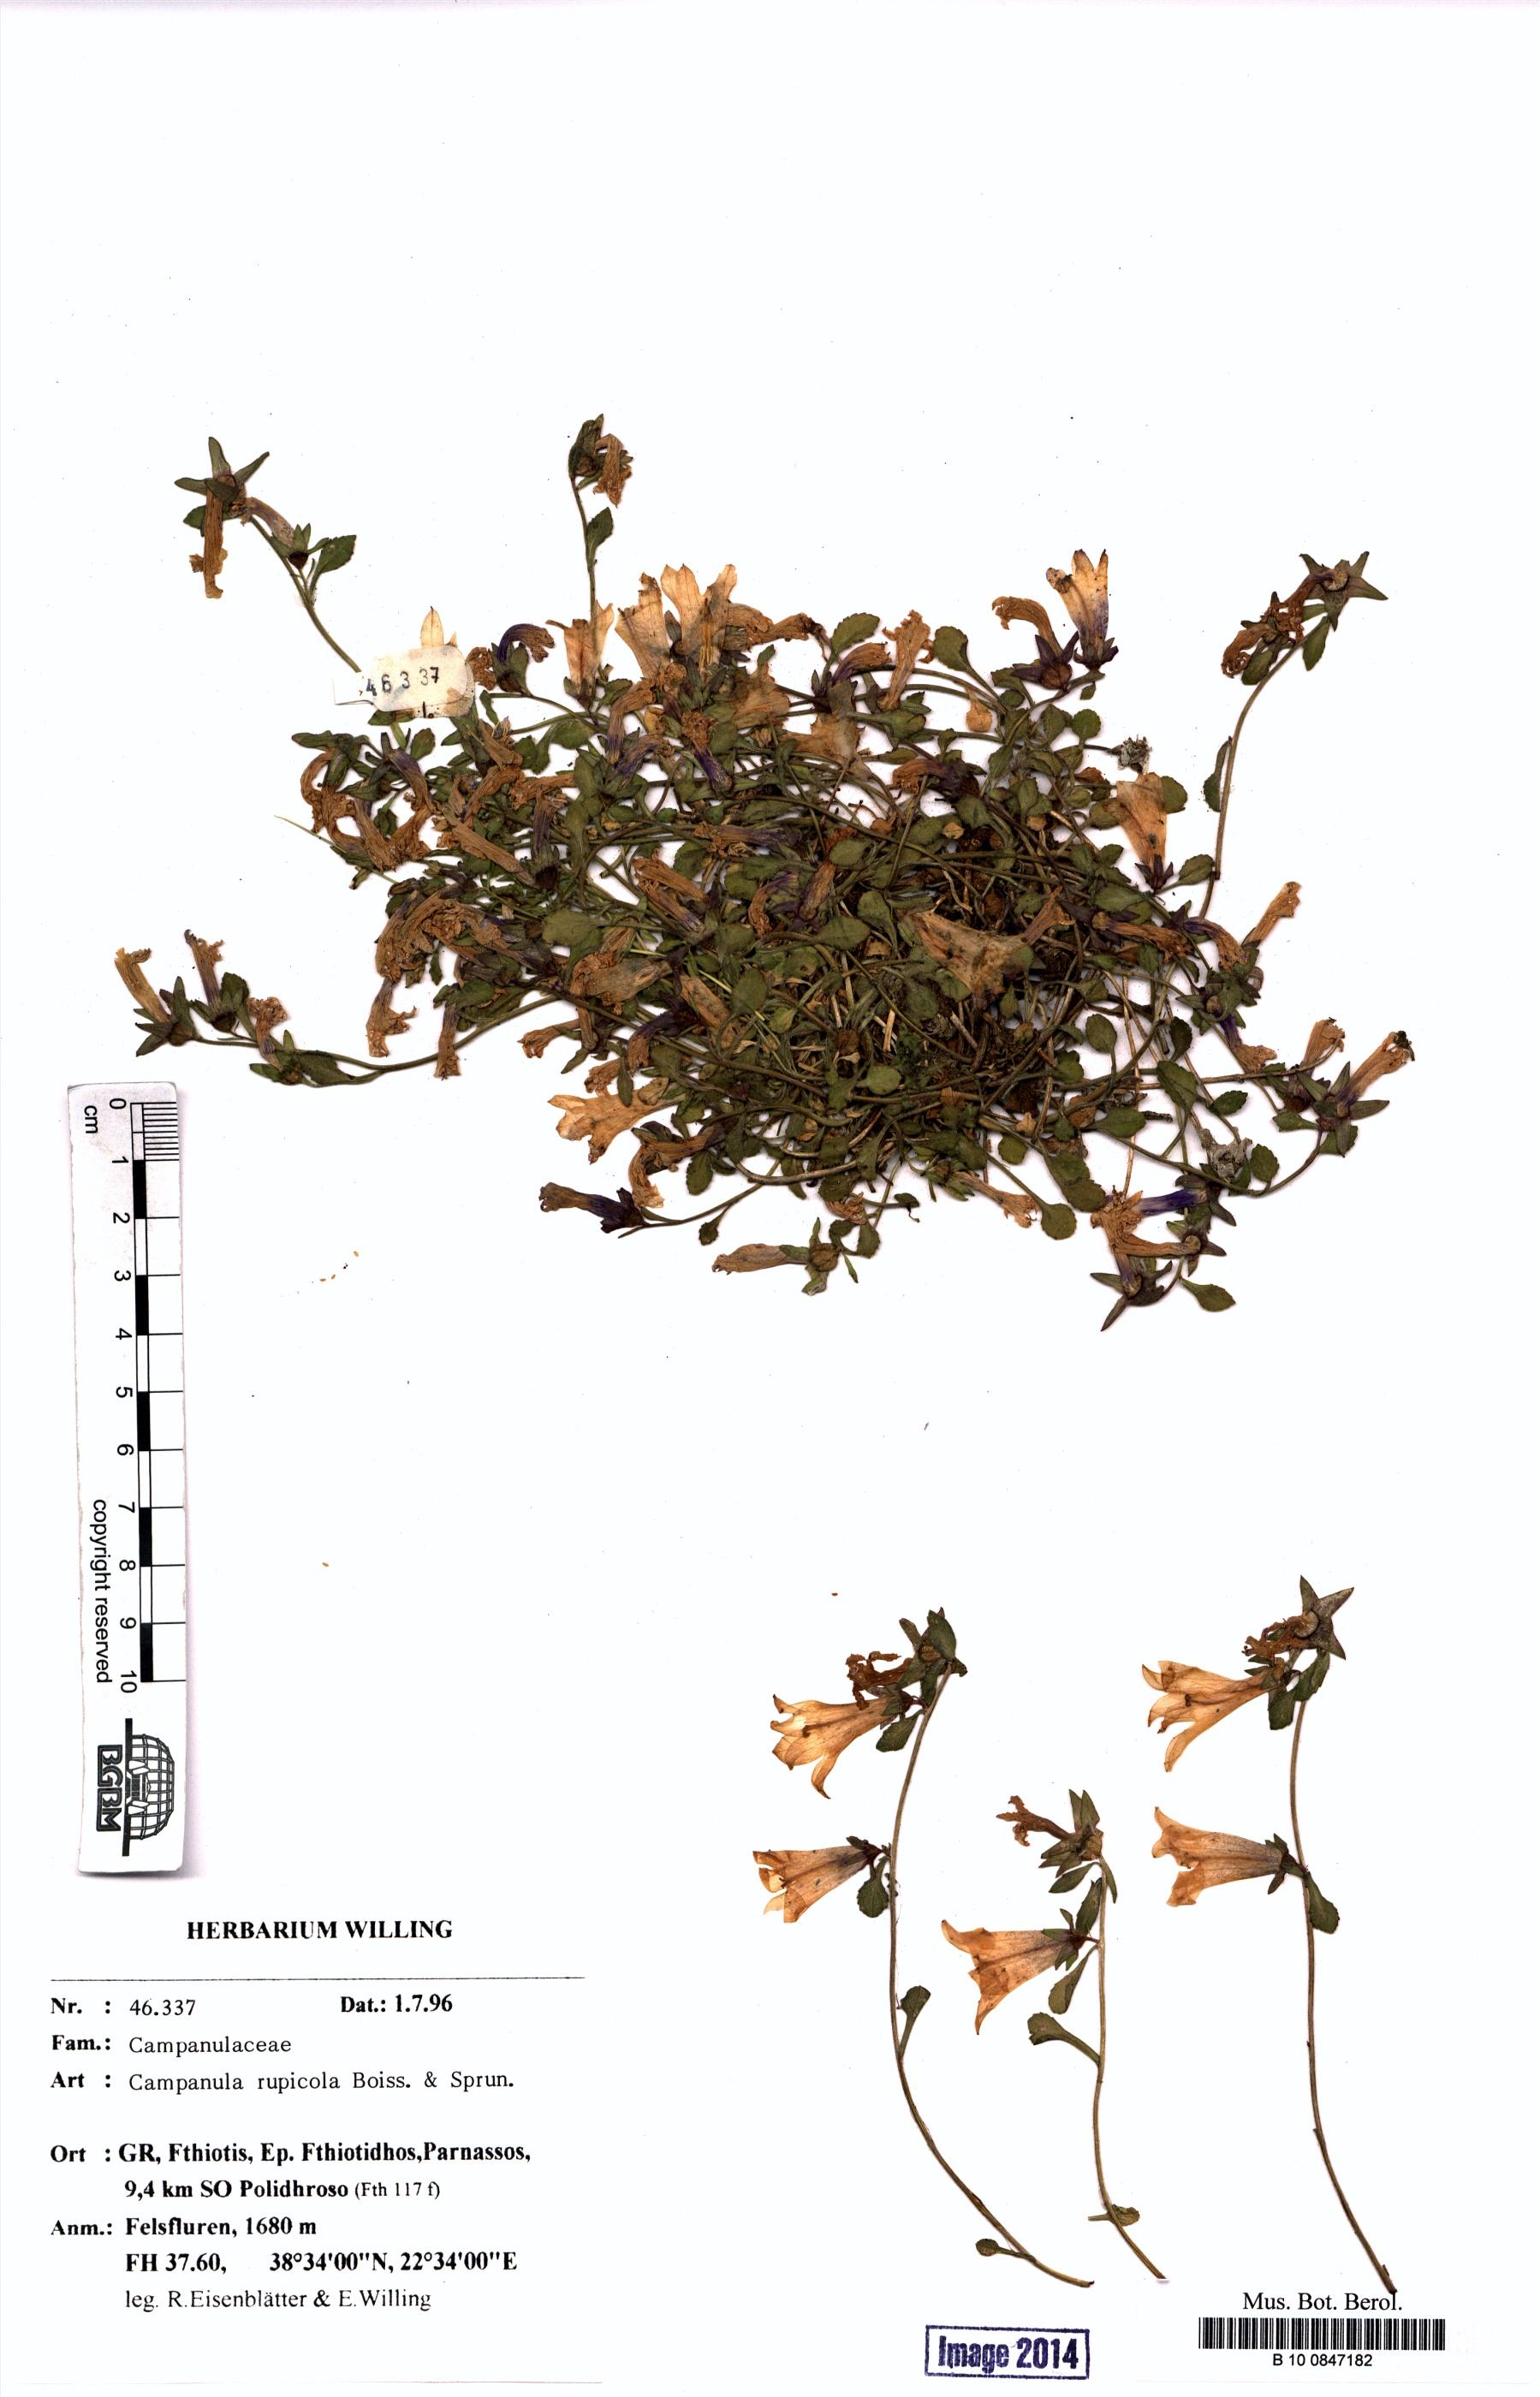 http://ww2.bgbm.org/herbarium/images/B/10/08/47/18/B_10_0847182.jpg